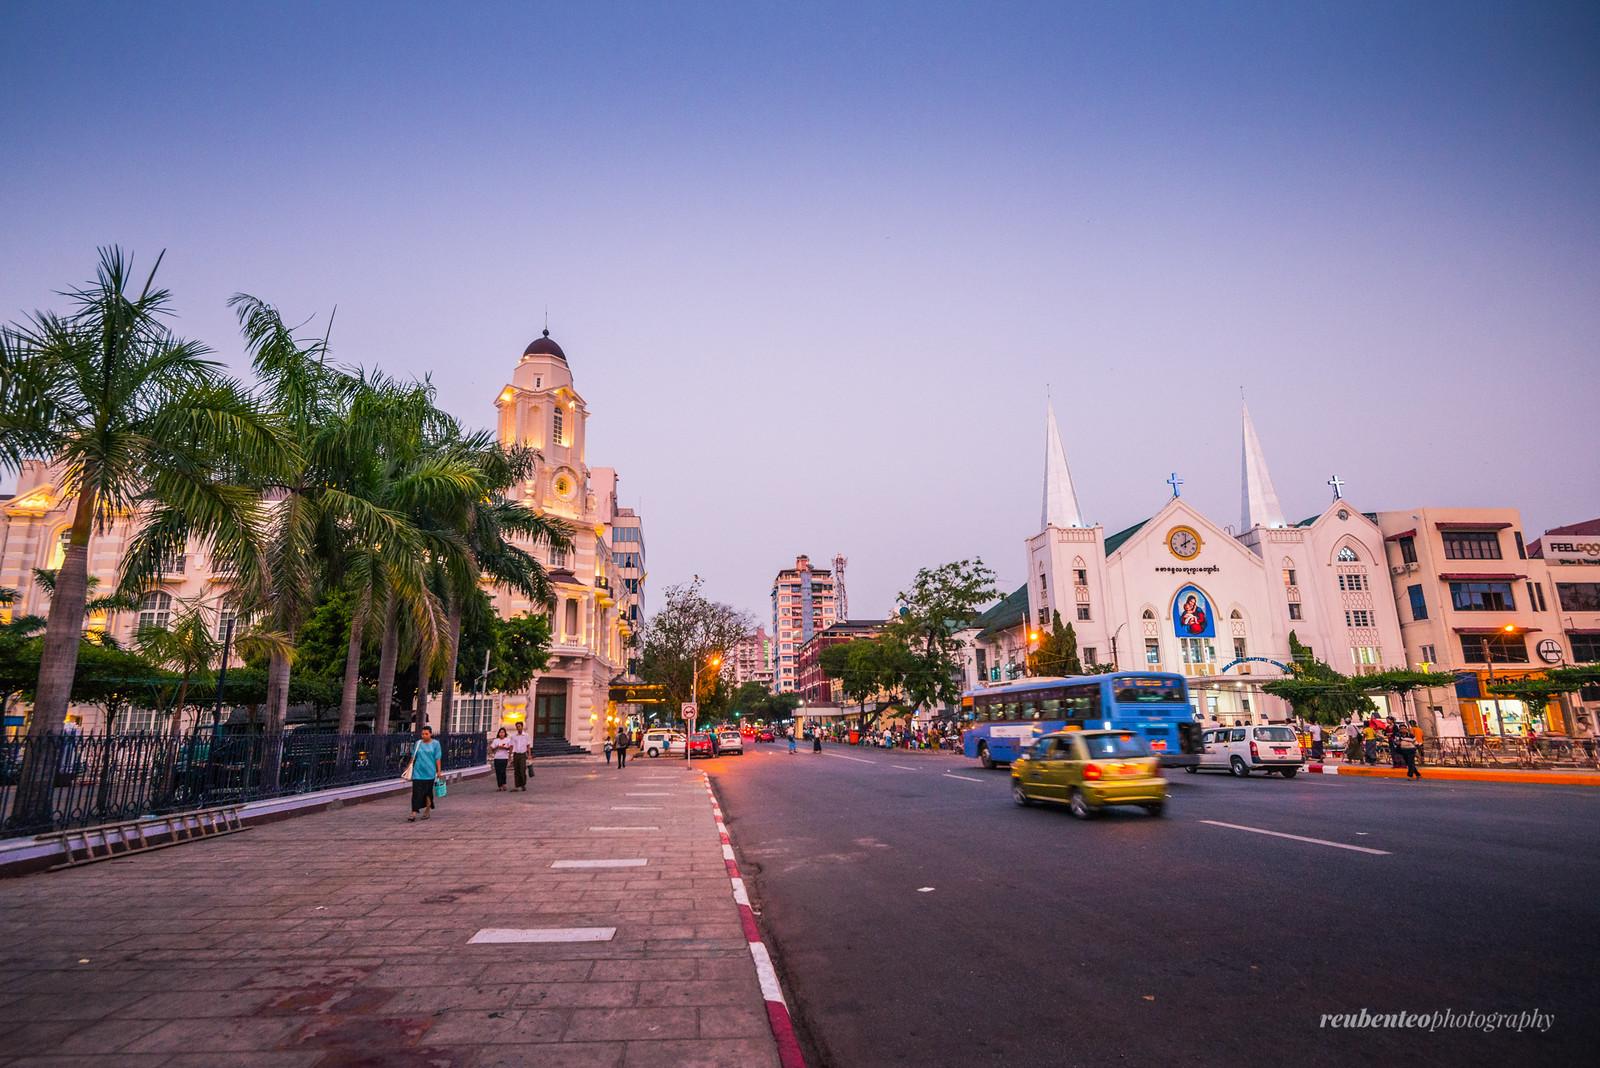 Yangon City Center at Sunset